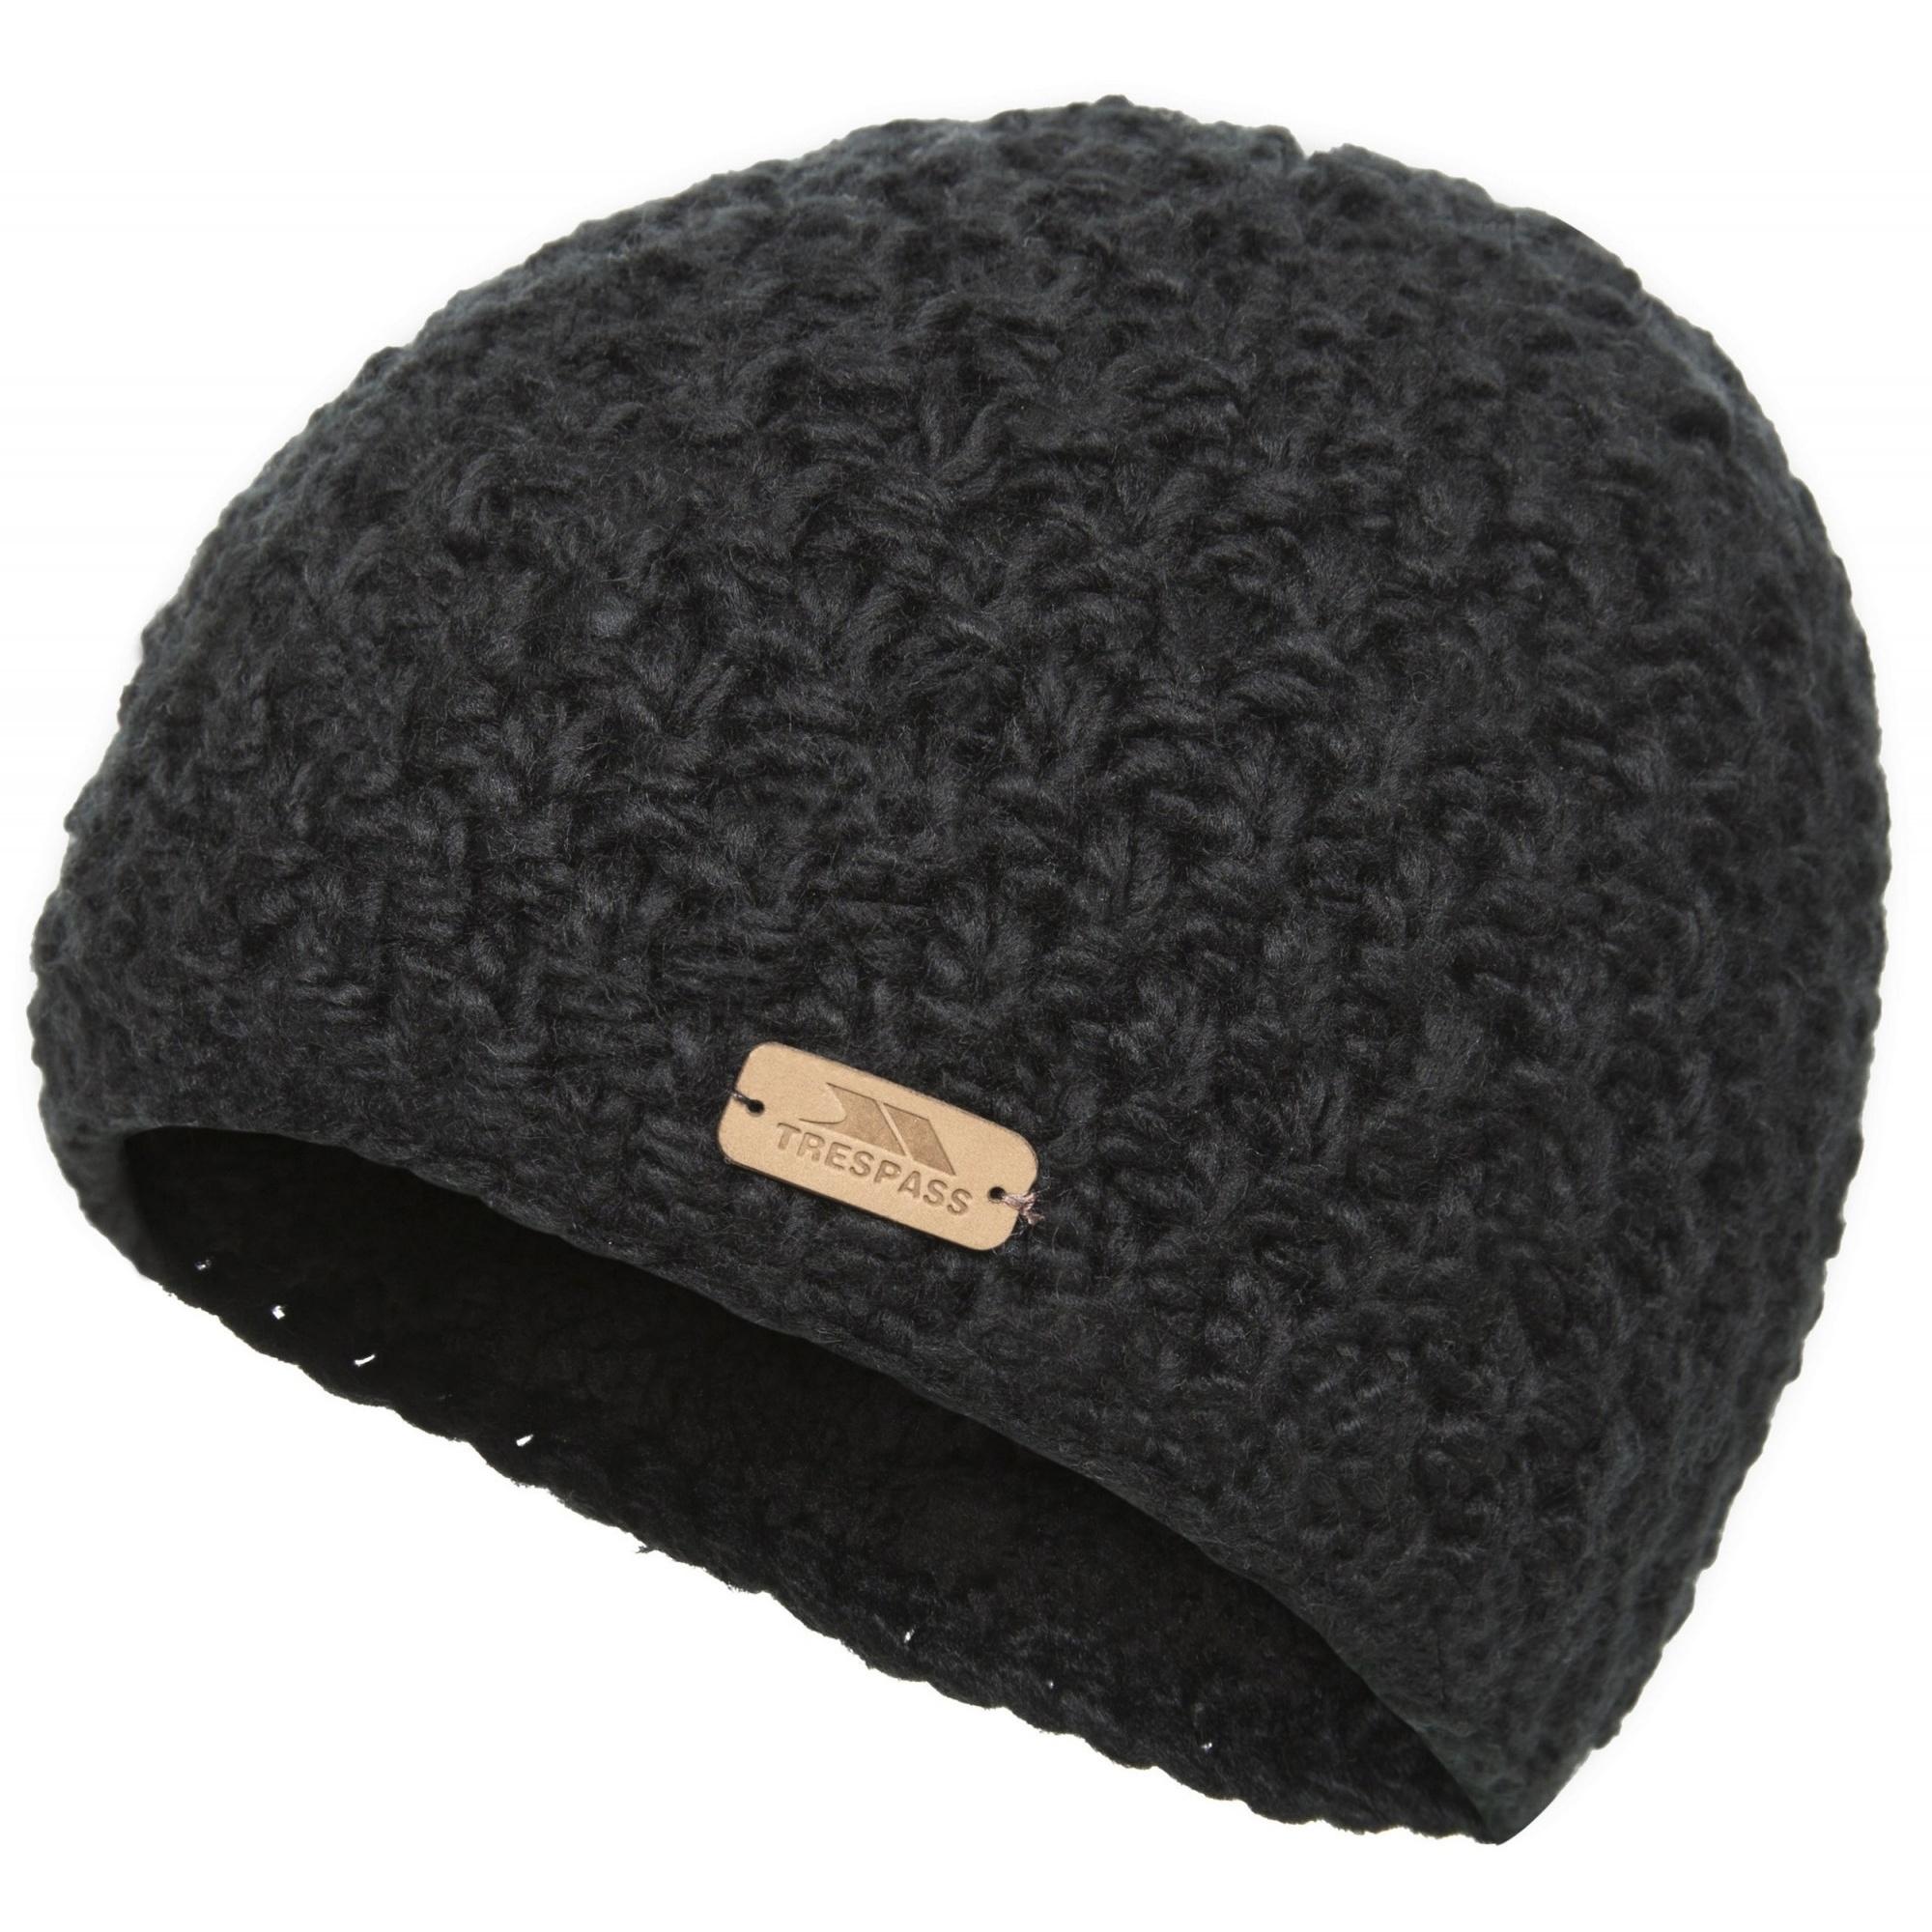 Trespass Bryony Womens Ear Warmer Wool Winter Crochet Knitted Ladies Headband